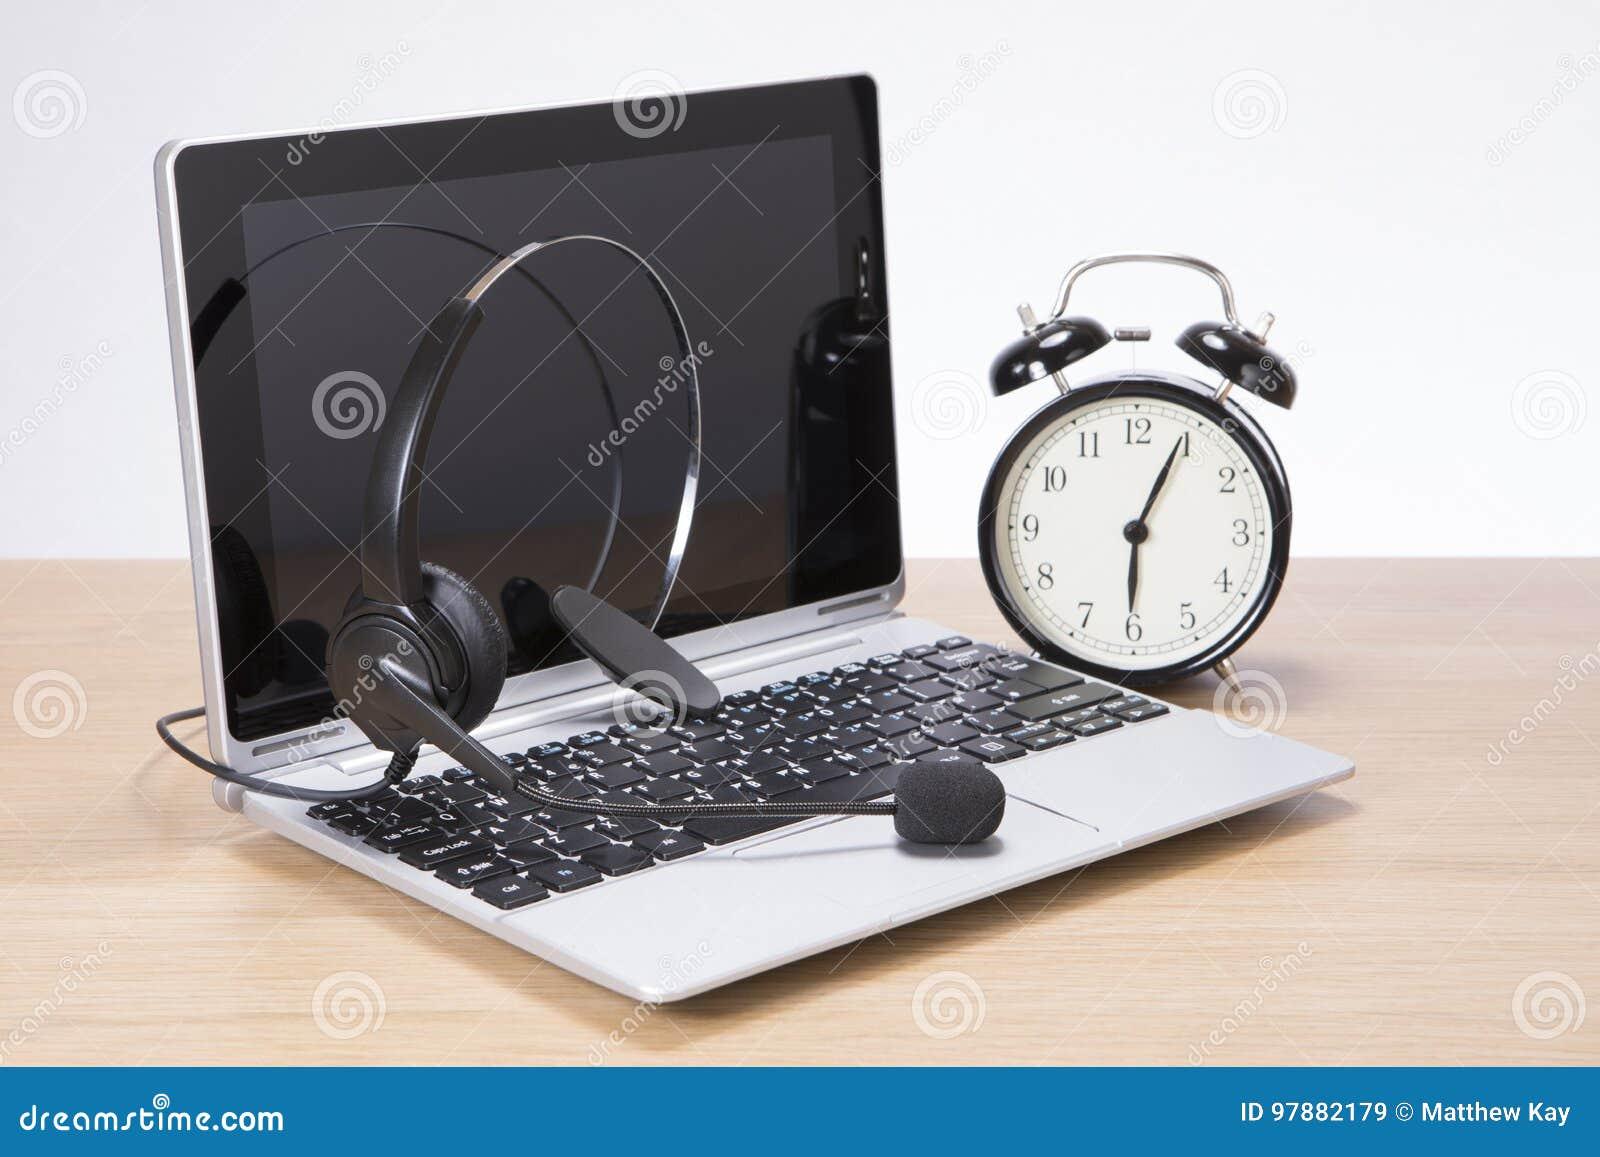 Alarm clock alongside a laptop and headset